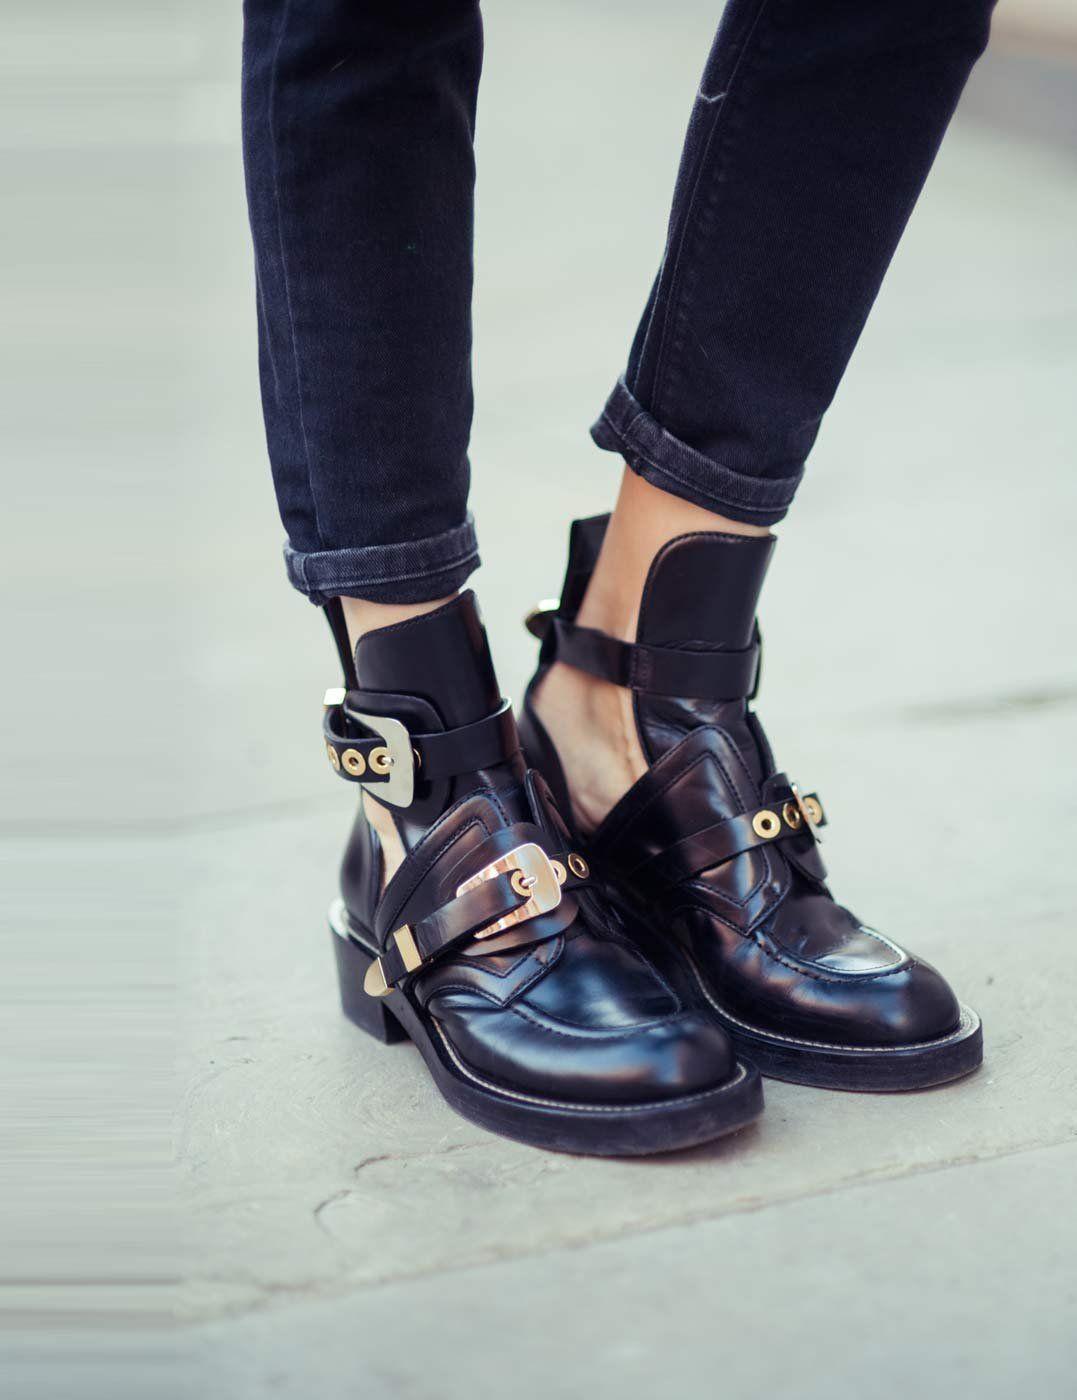 The ceinture cut-out ankle boots BALENCIAGA Black